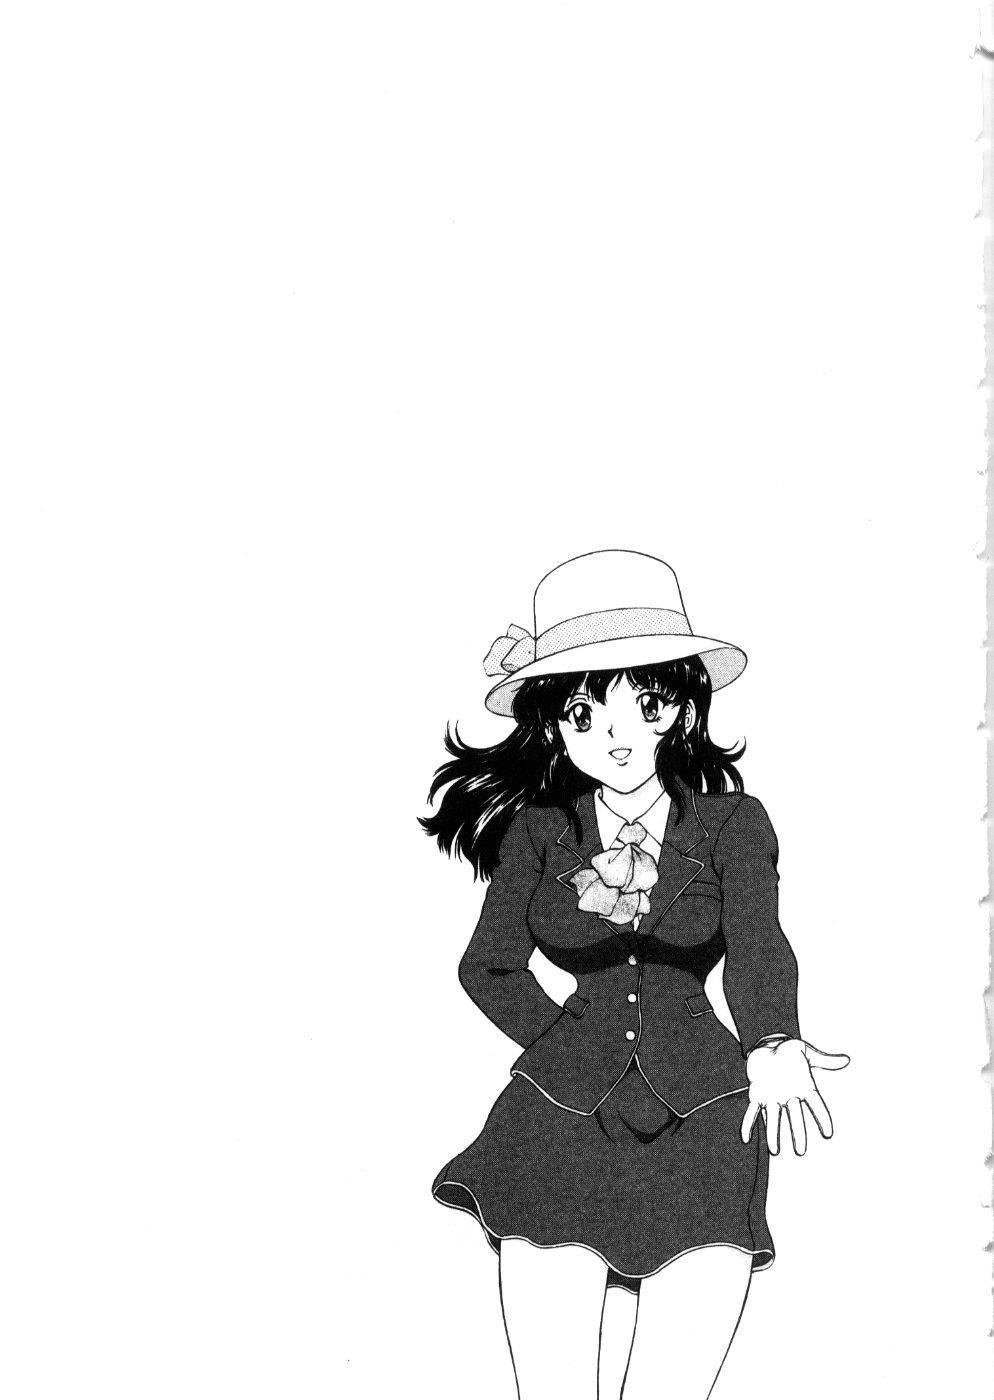 Oneechan-tachi ga Yatte Kuru 03 192